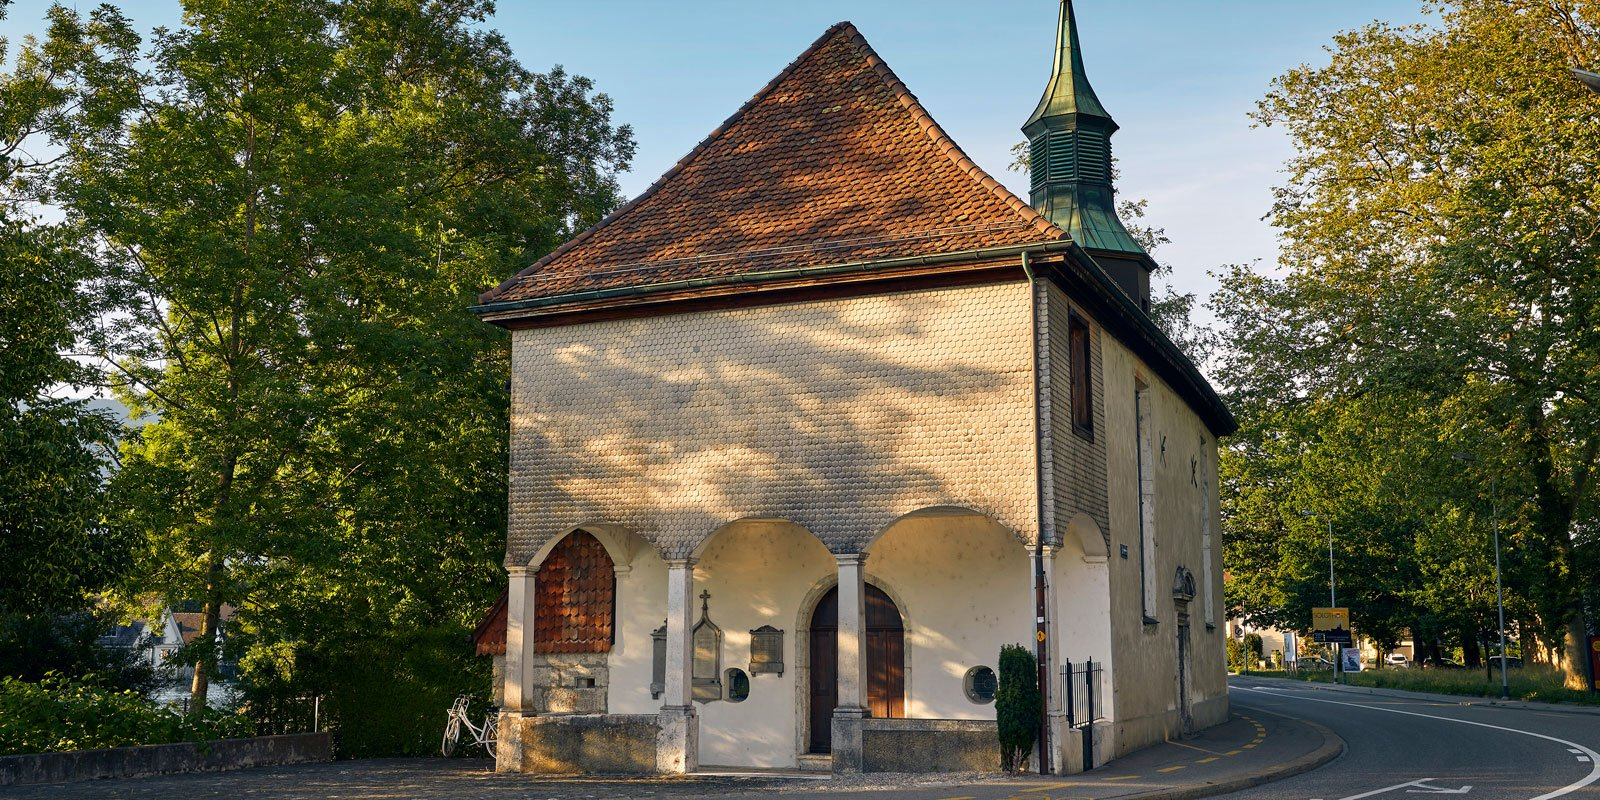 Kapelle Dreibeinskreuz Solothurn